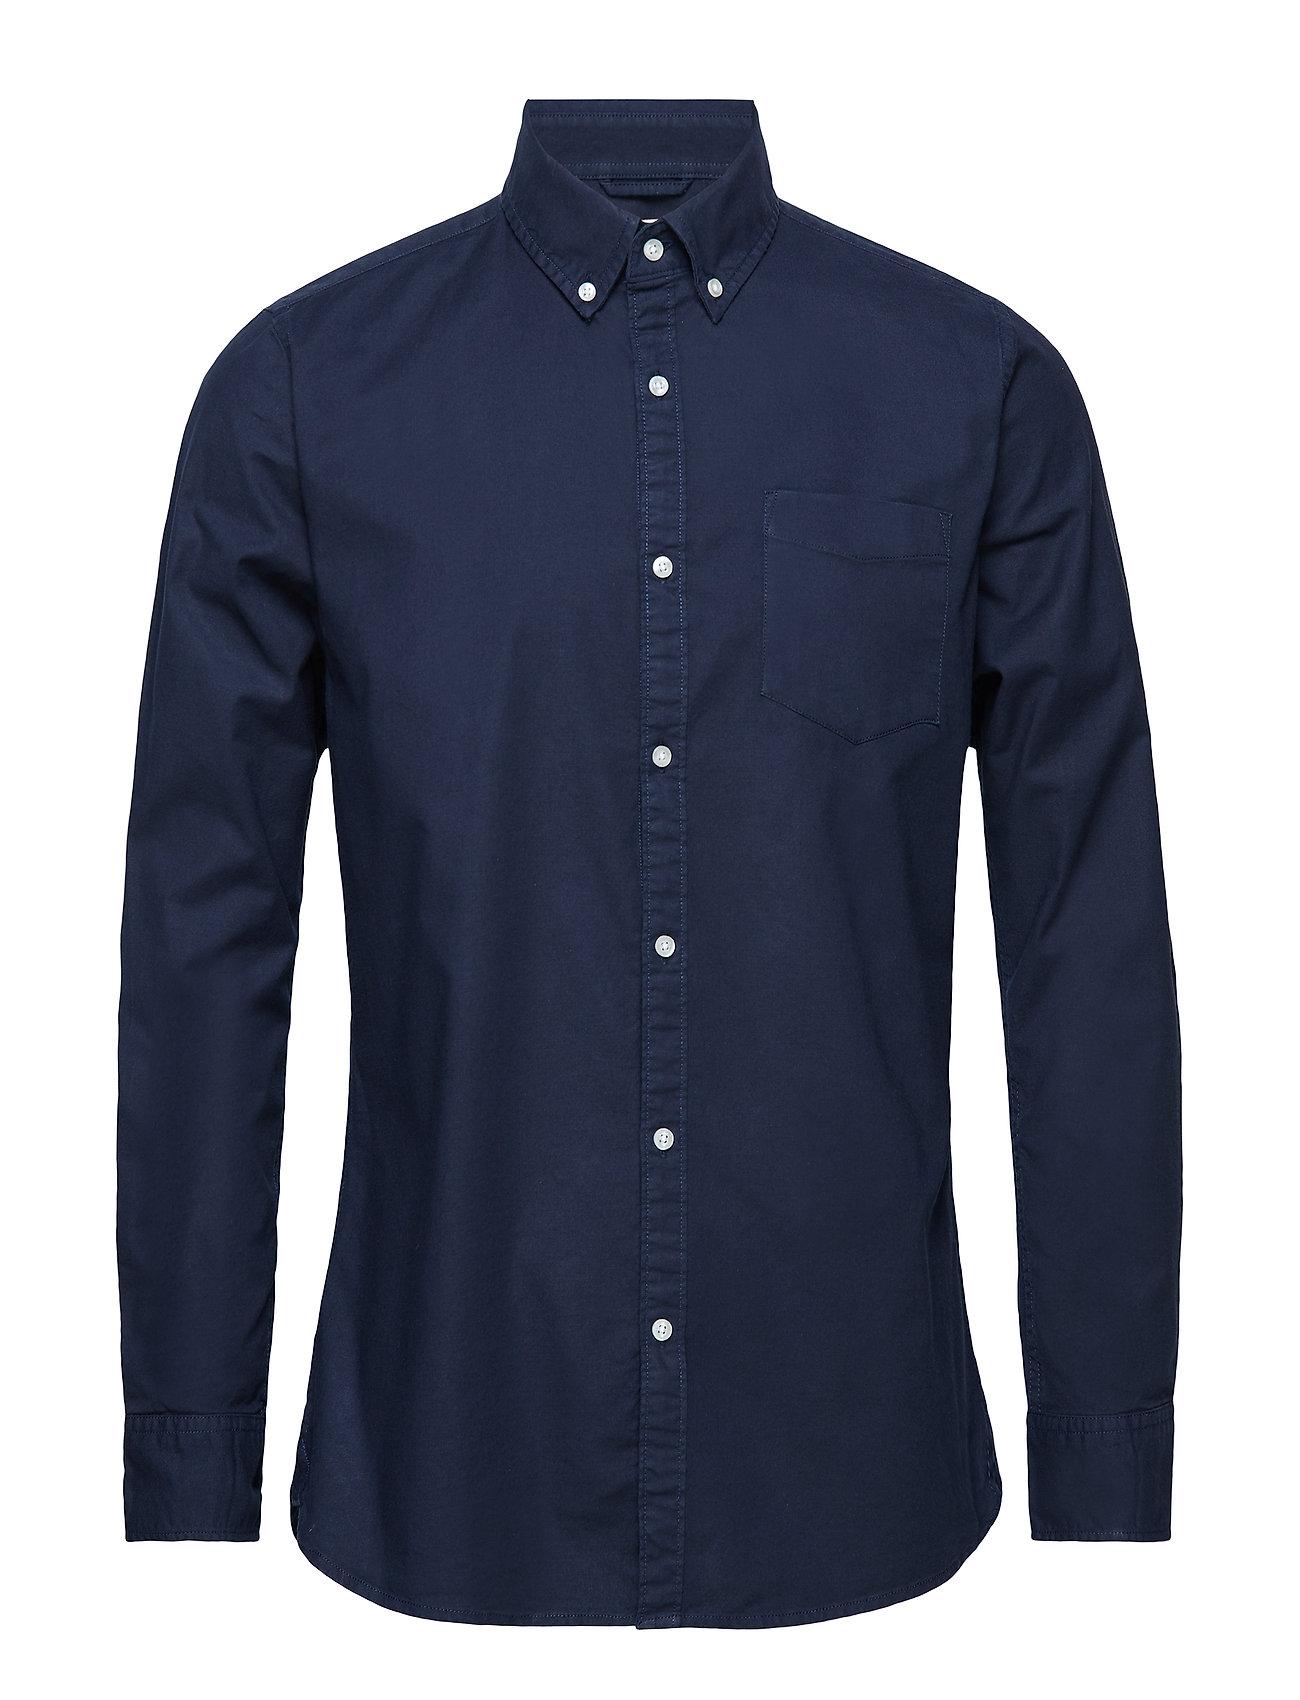 Knowledge Cotton Apparel ELDER LS oxford shirt - GOTS/Vegan - TOTAL ECLIPSE